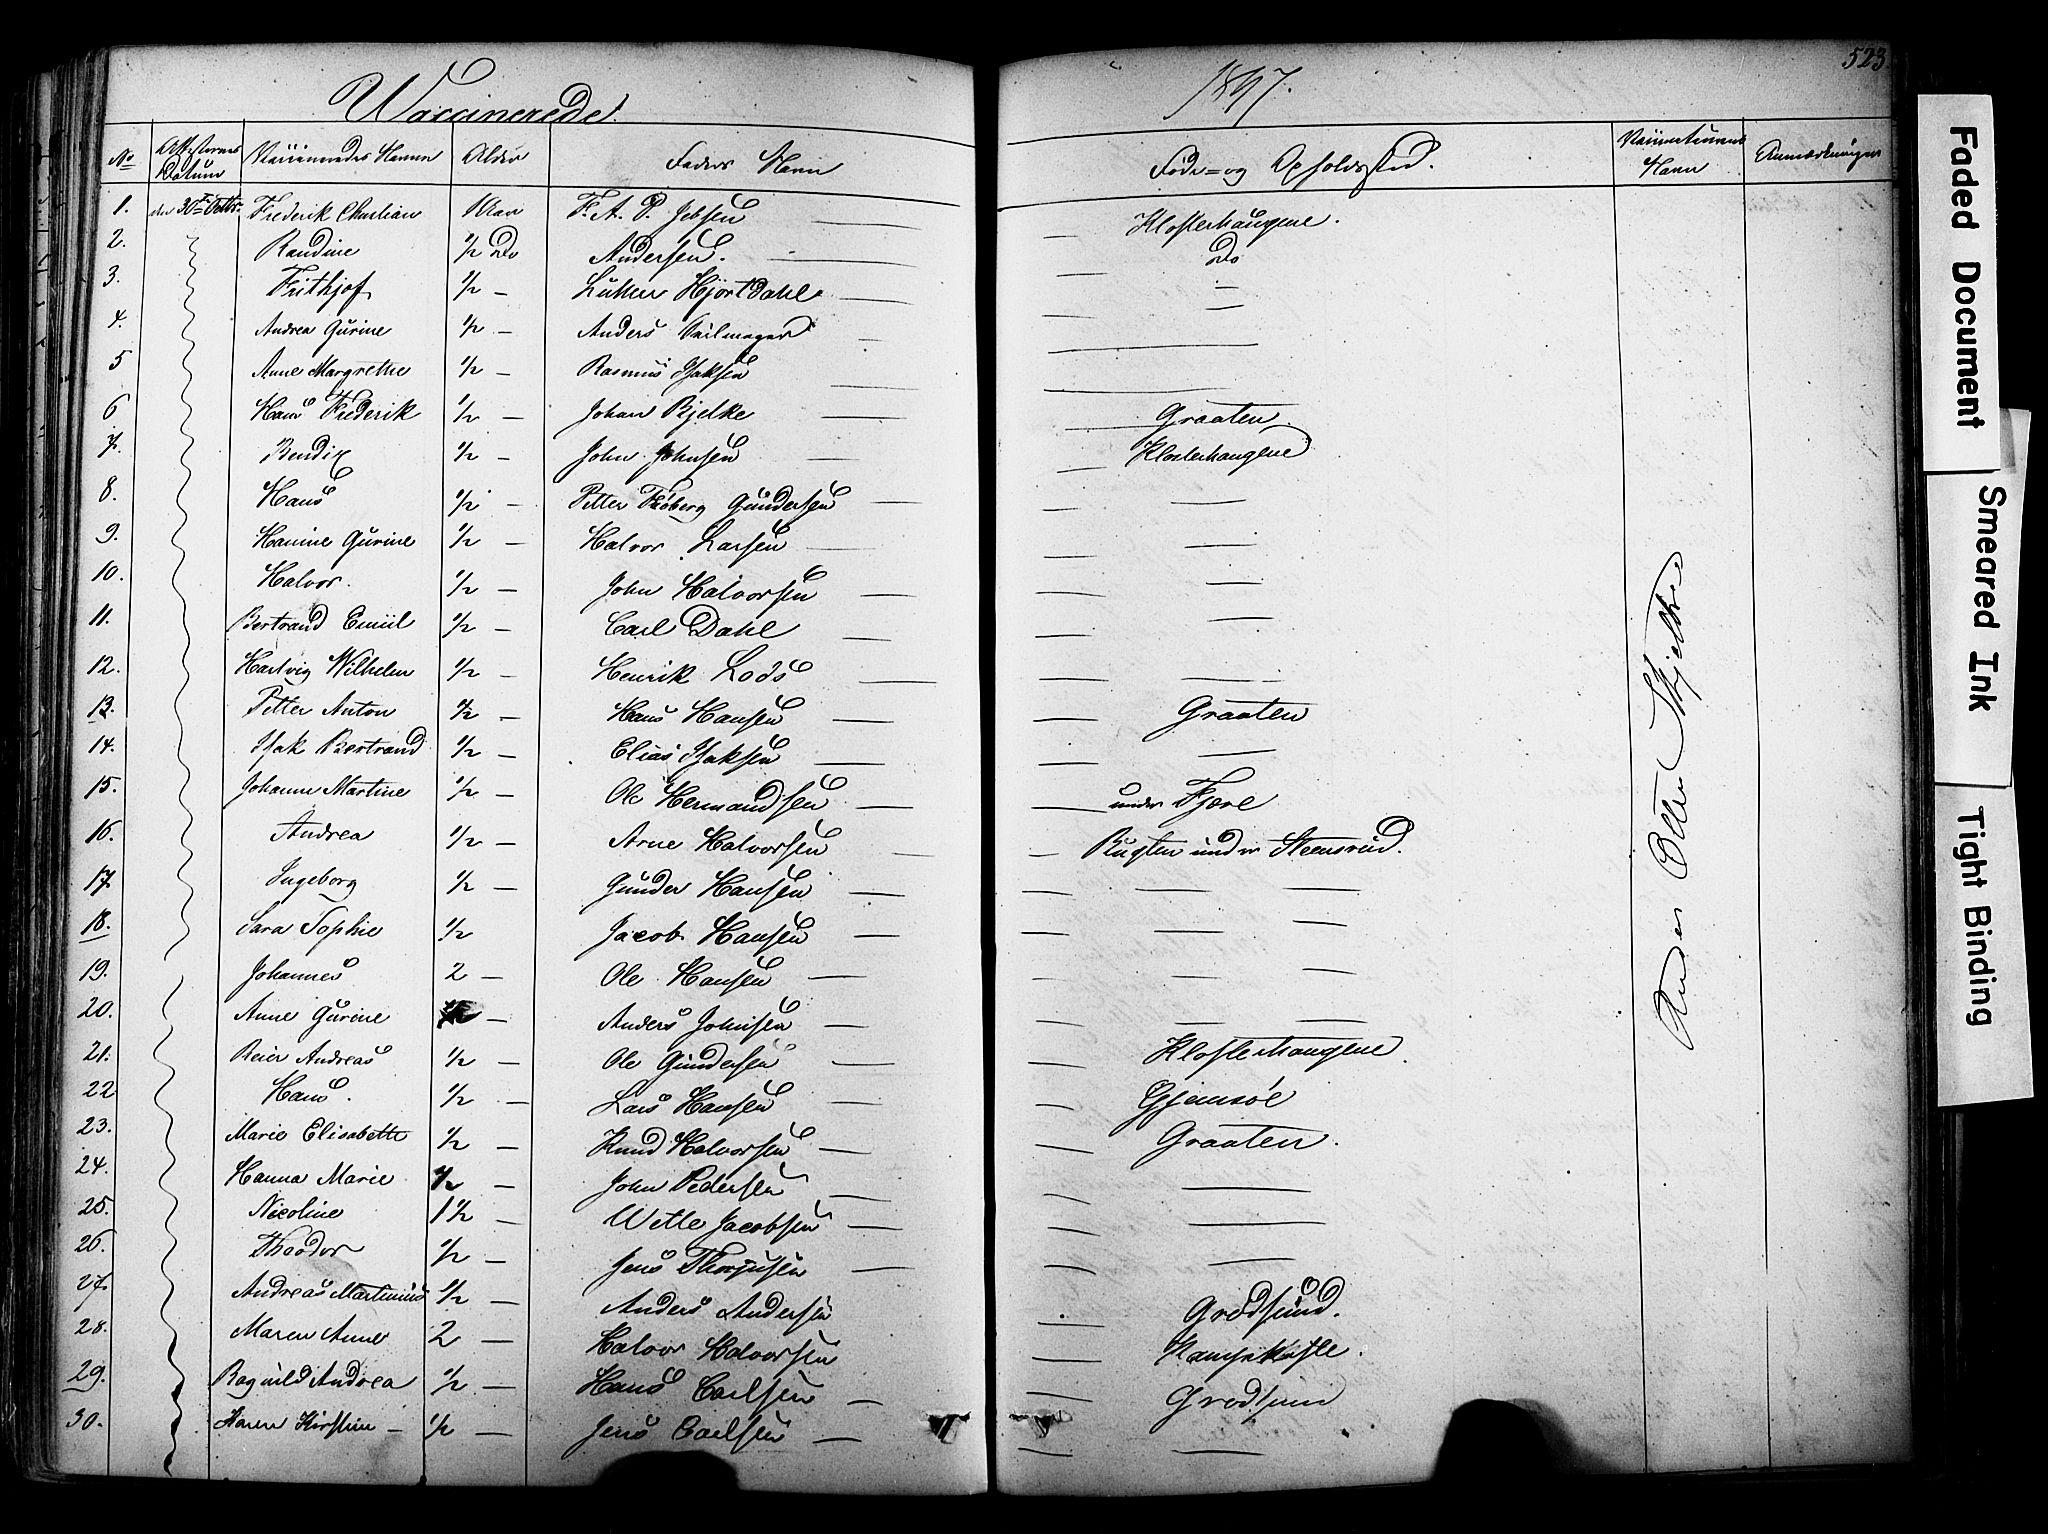 SAKO, Solum kirkebøker, F/Fa/L0006: Ministerialbok nr. I 6, 1844-1855, s. 523